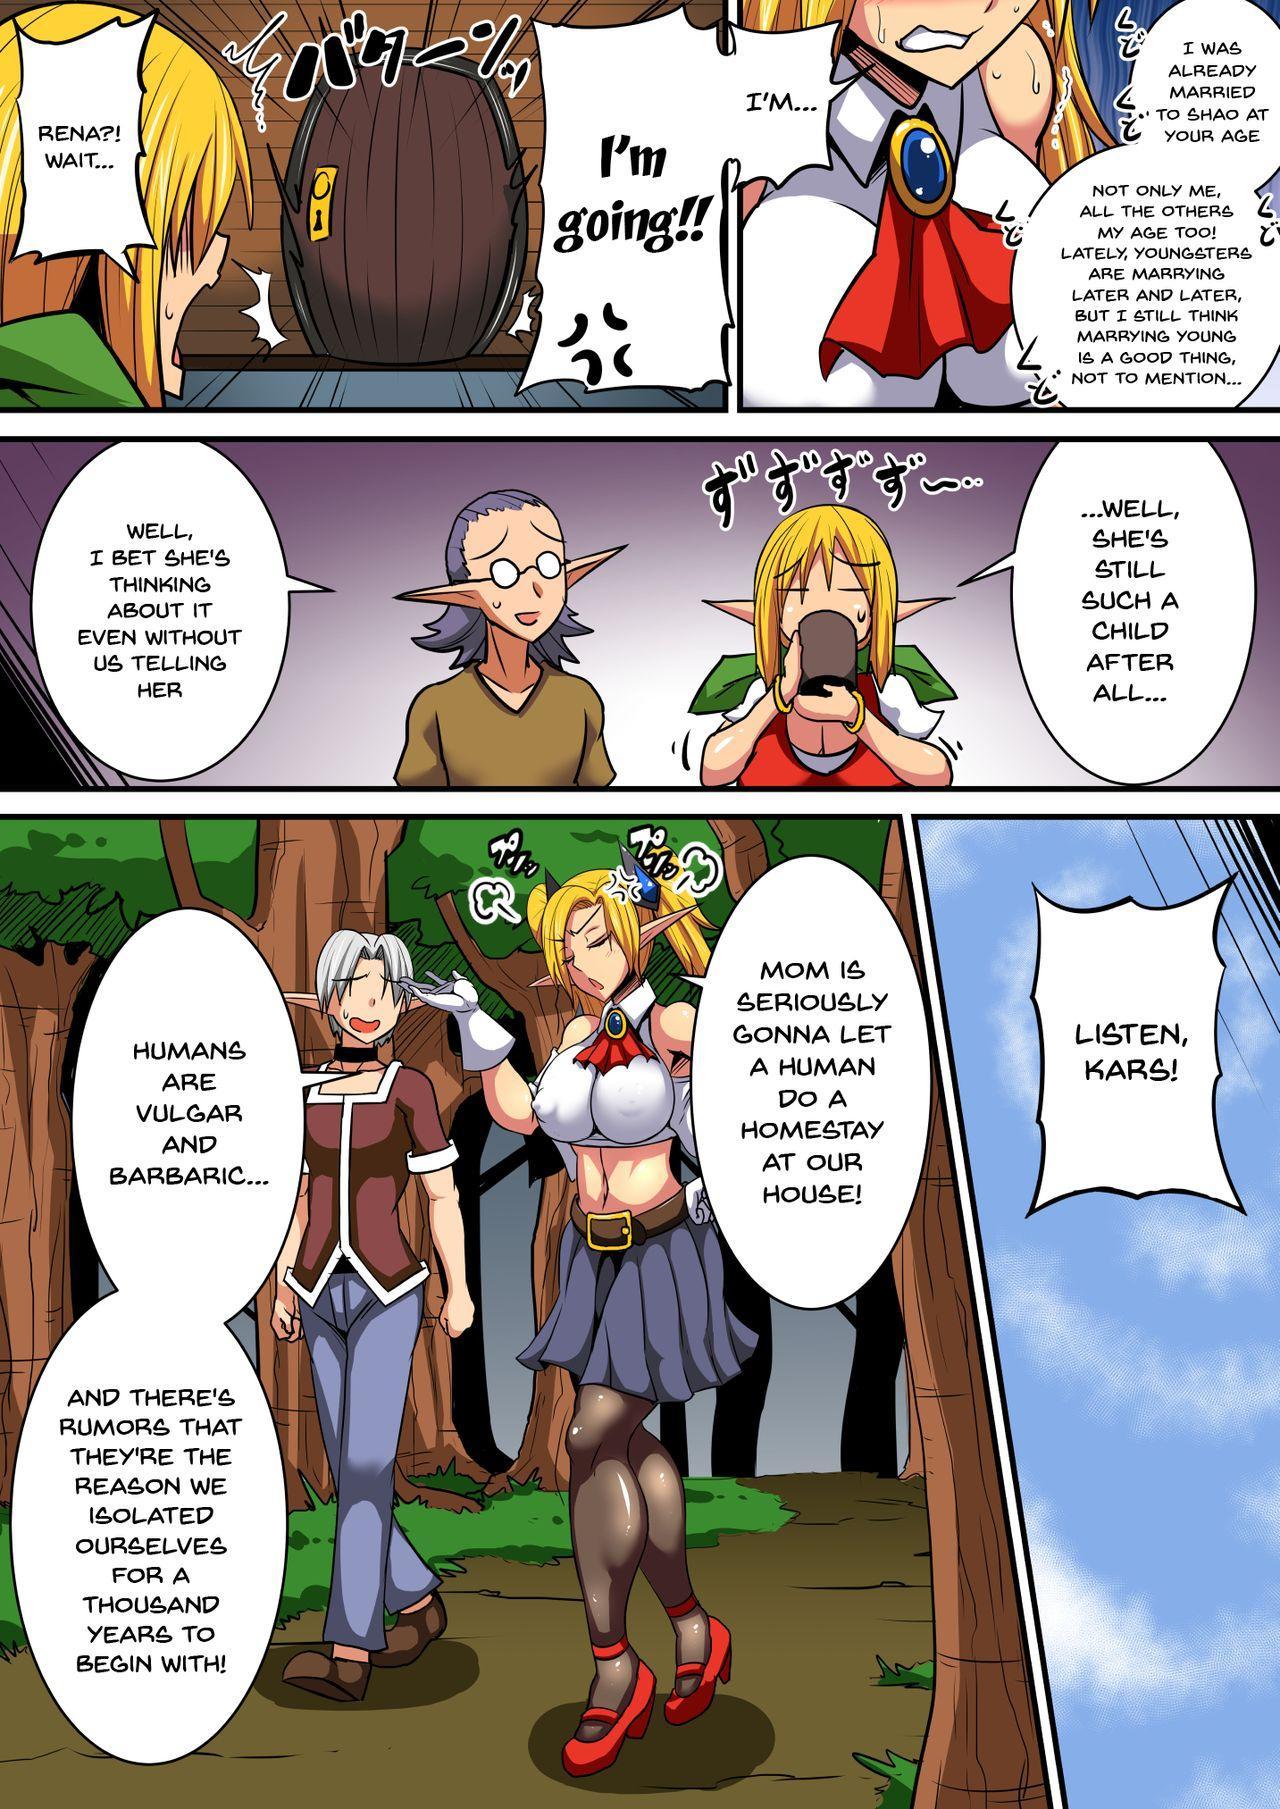 [Haneinu] Elf Oyako to Pakopako Ibunka Kouryuu! ~Lena Hen~   Having a Culture Exchange With an Elf Mother and Daughter ~Lena Edition~ [English] {Doujins.com} 4